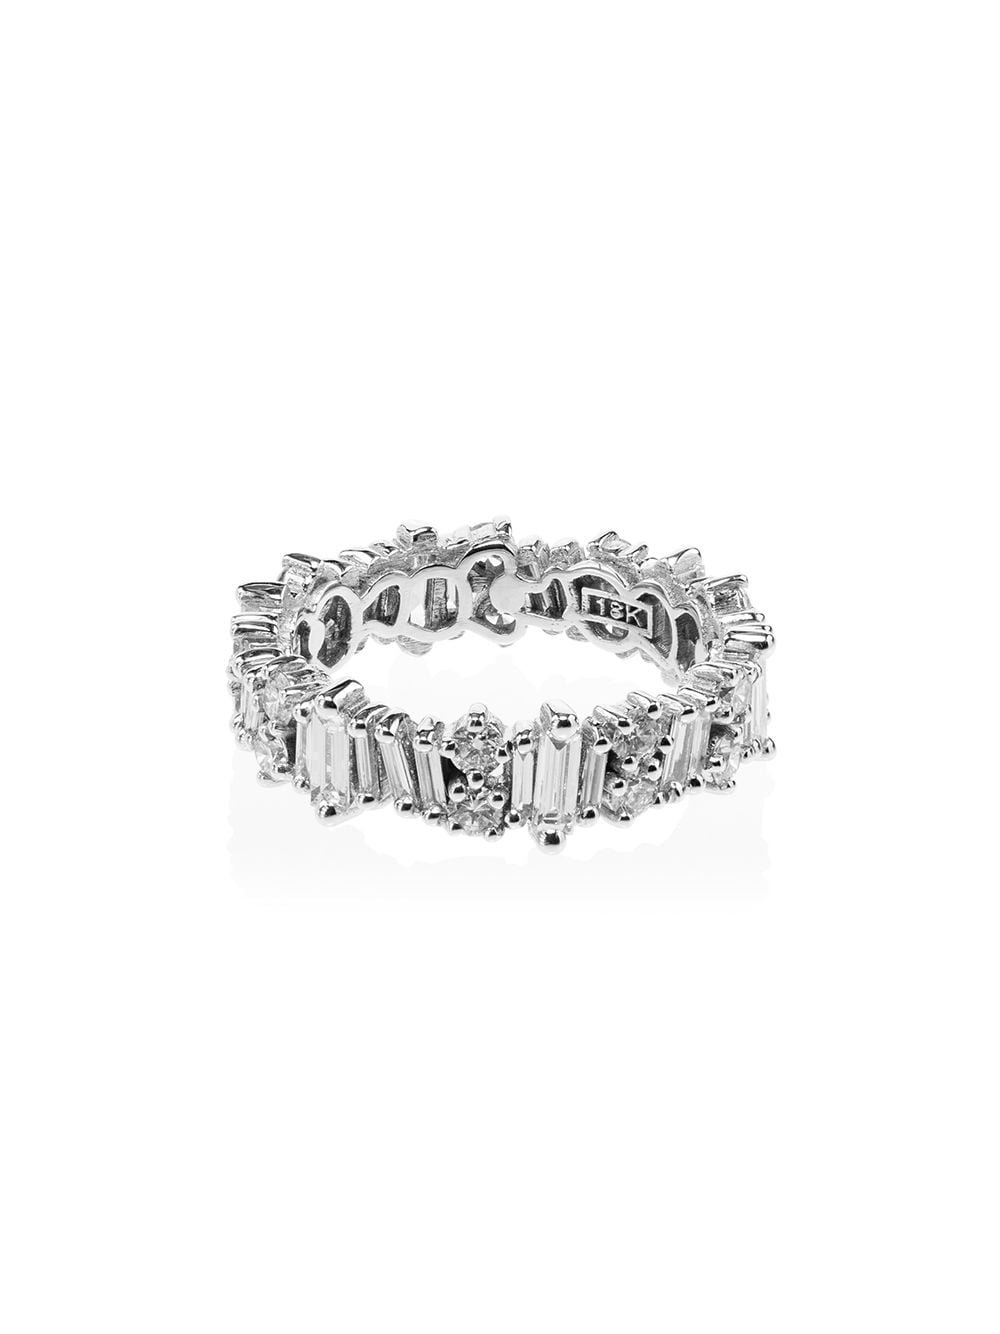 Suzanne Kalan 18kt White Gold Fireworks Diamond Eternity Ring | Farfetch.com